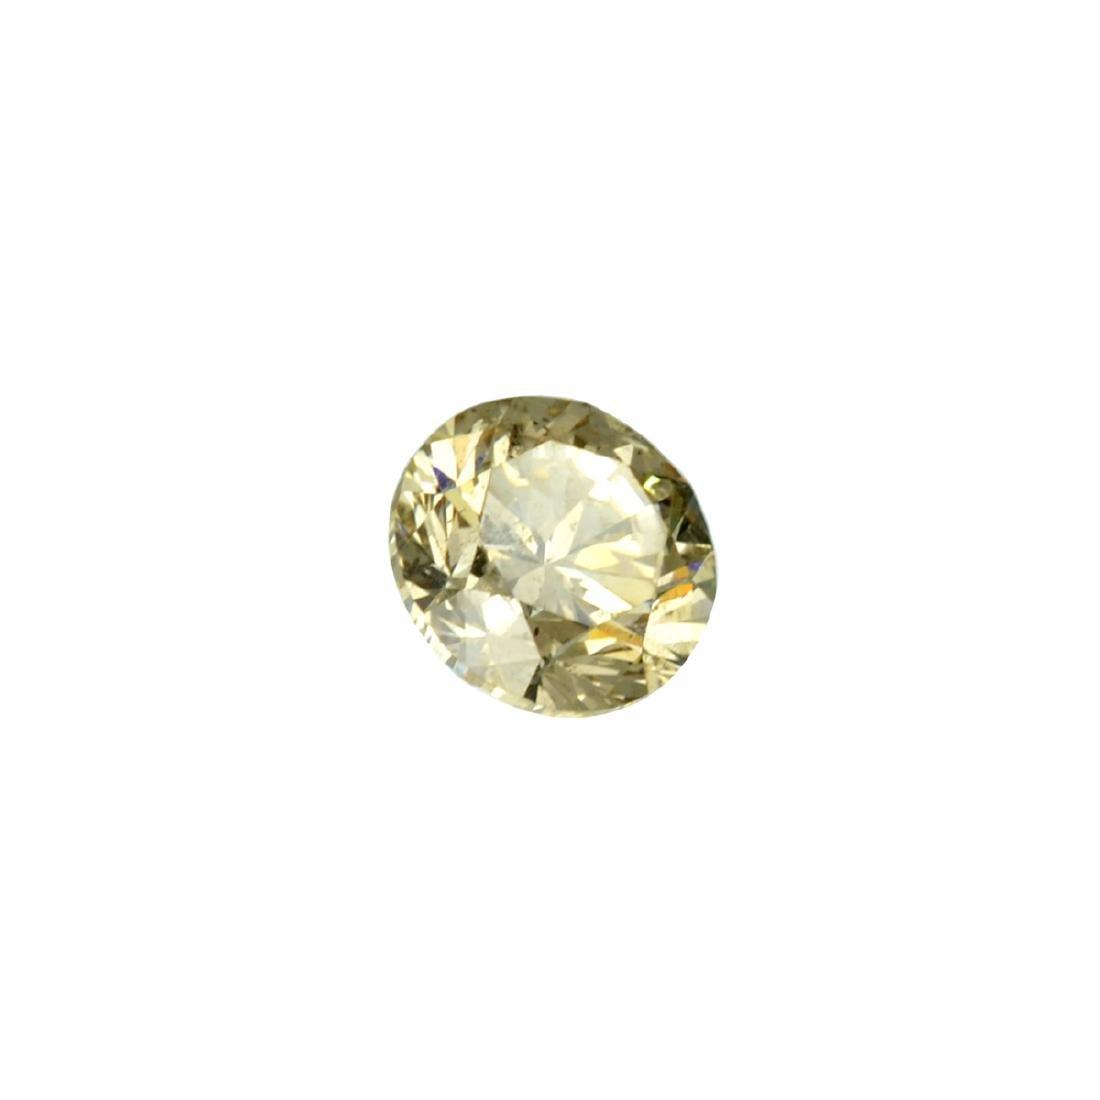 Fine Jewelry GIA Certified 0.77CT Brilliant Round Cut